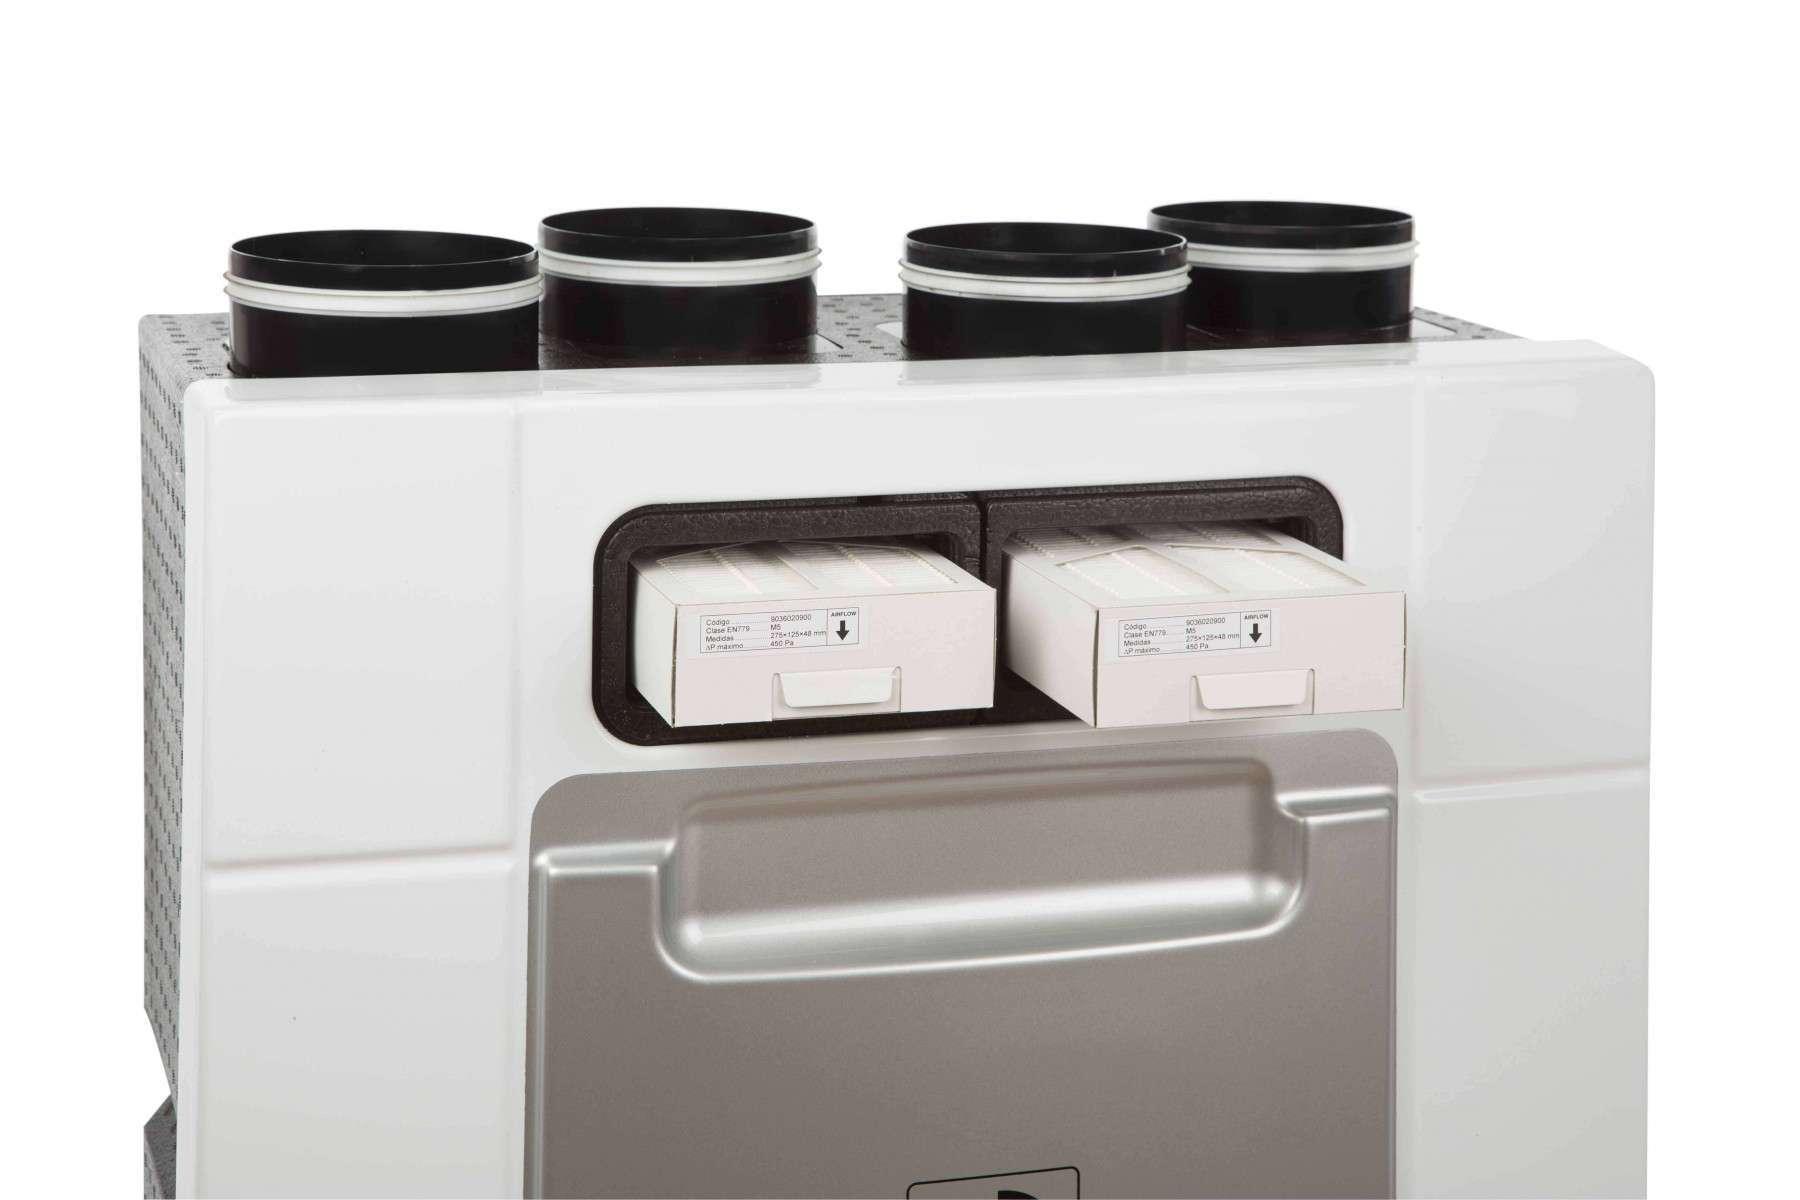 Kit filtres F7 + G4 pour DOMEO 210 UNELVENT 600903